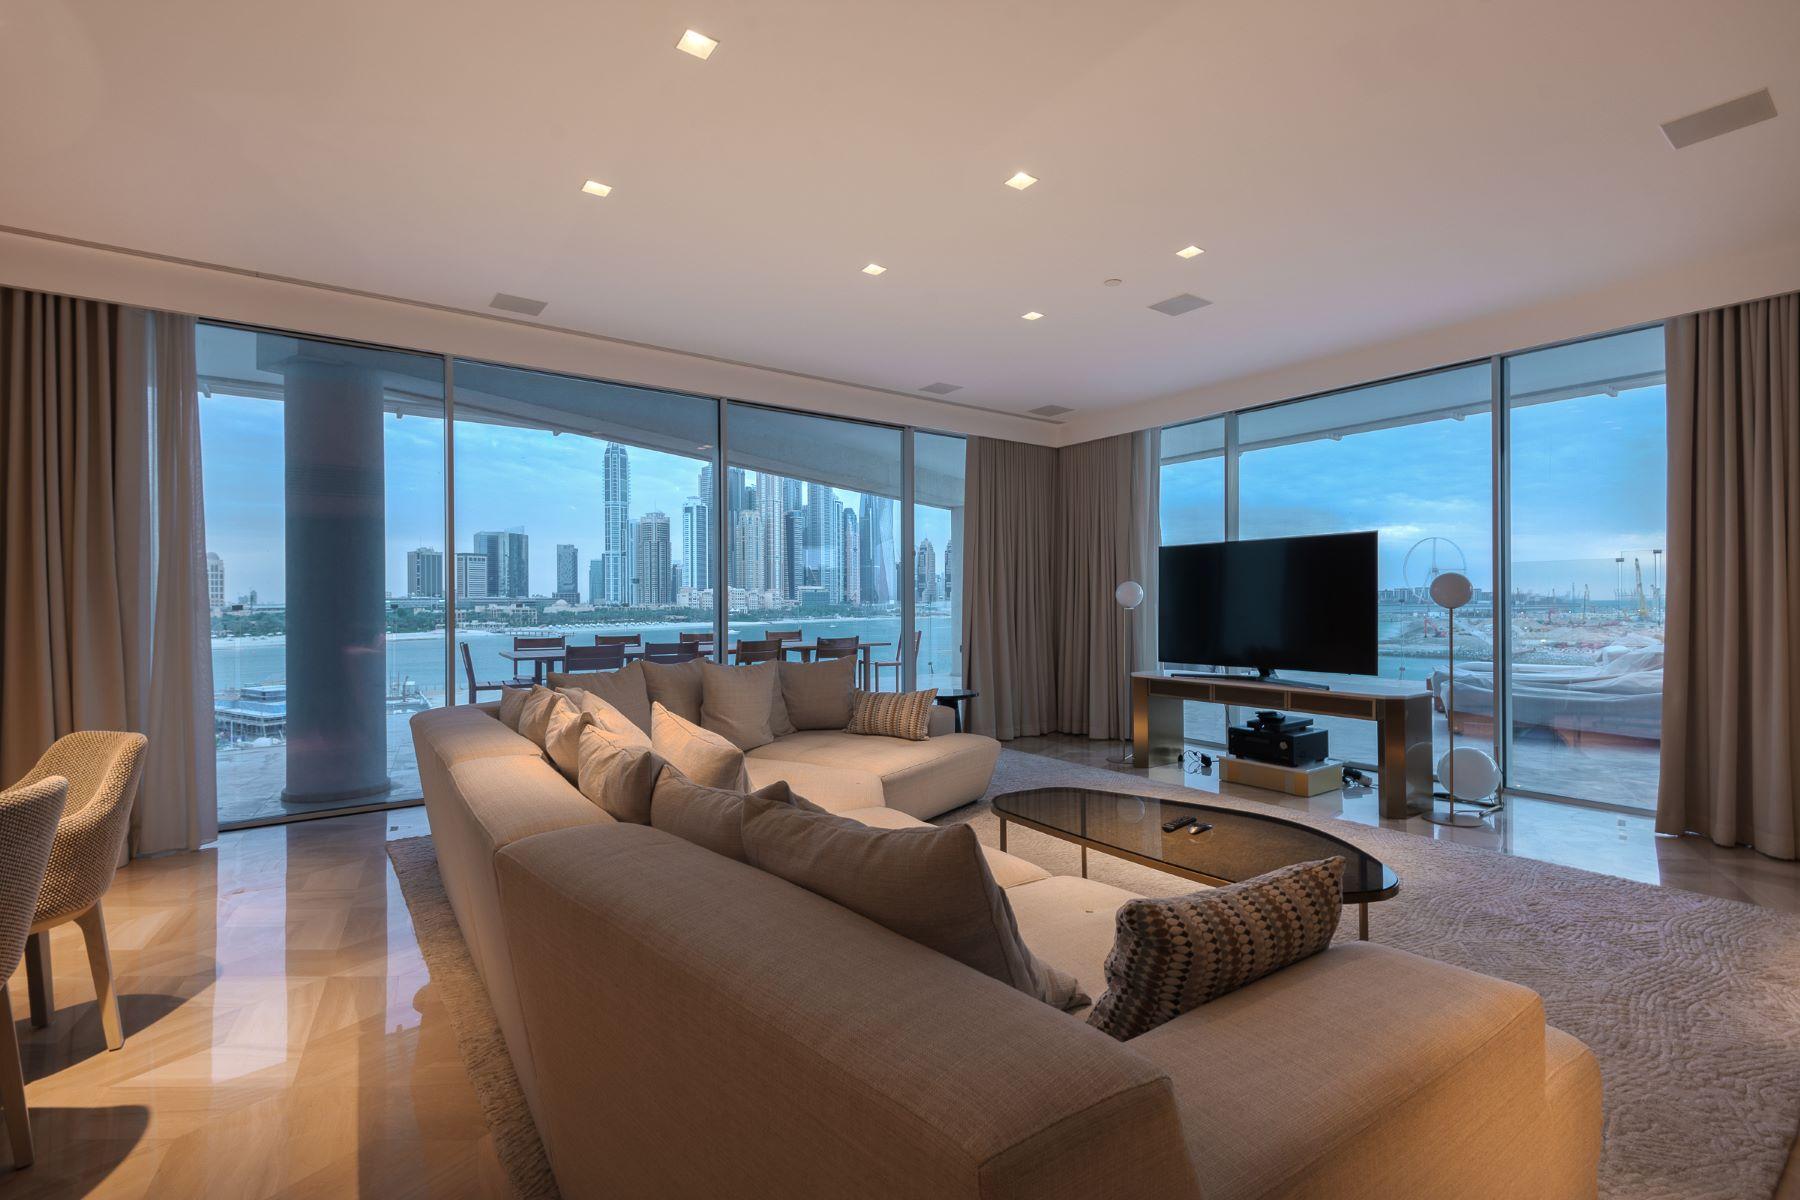 Apartments 为 出租 在 Full Sea View Penthouse Five Star resort 迪拜, 杜拜 阿联酋